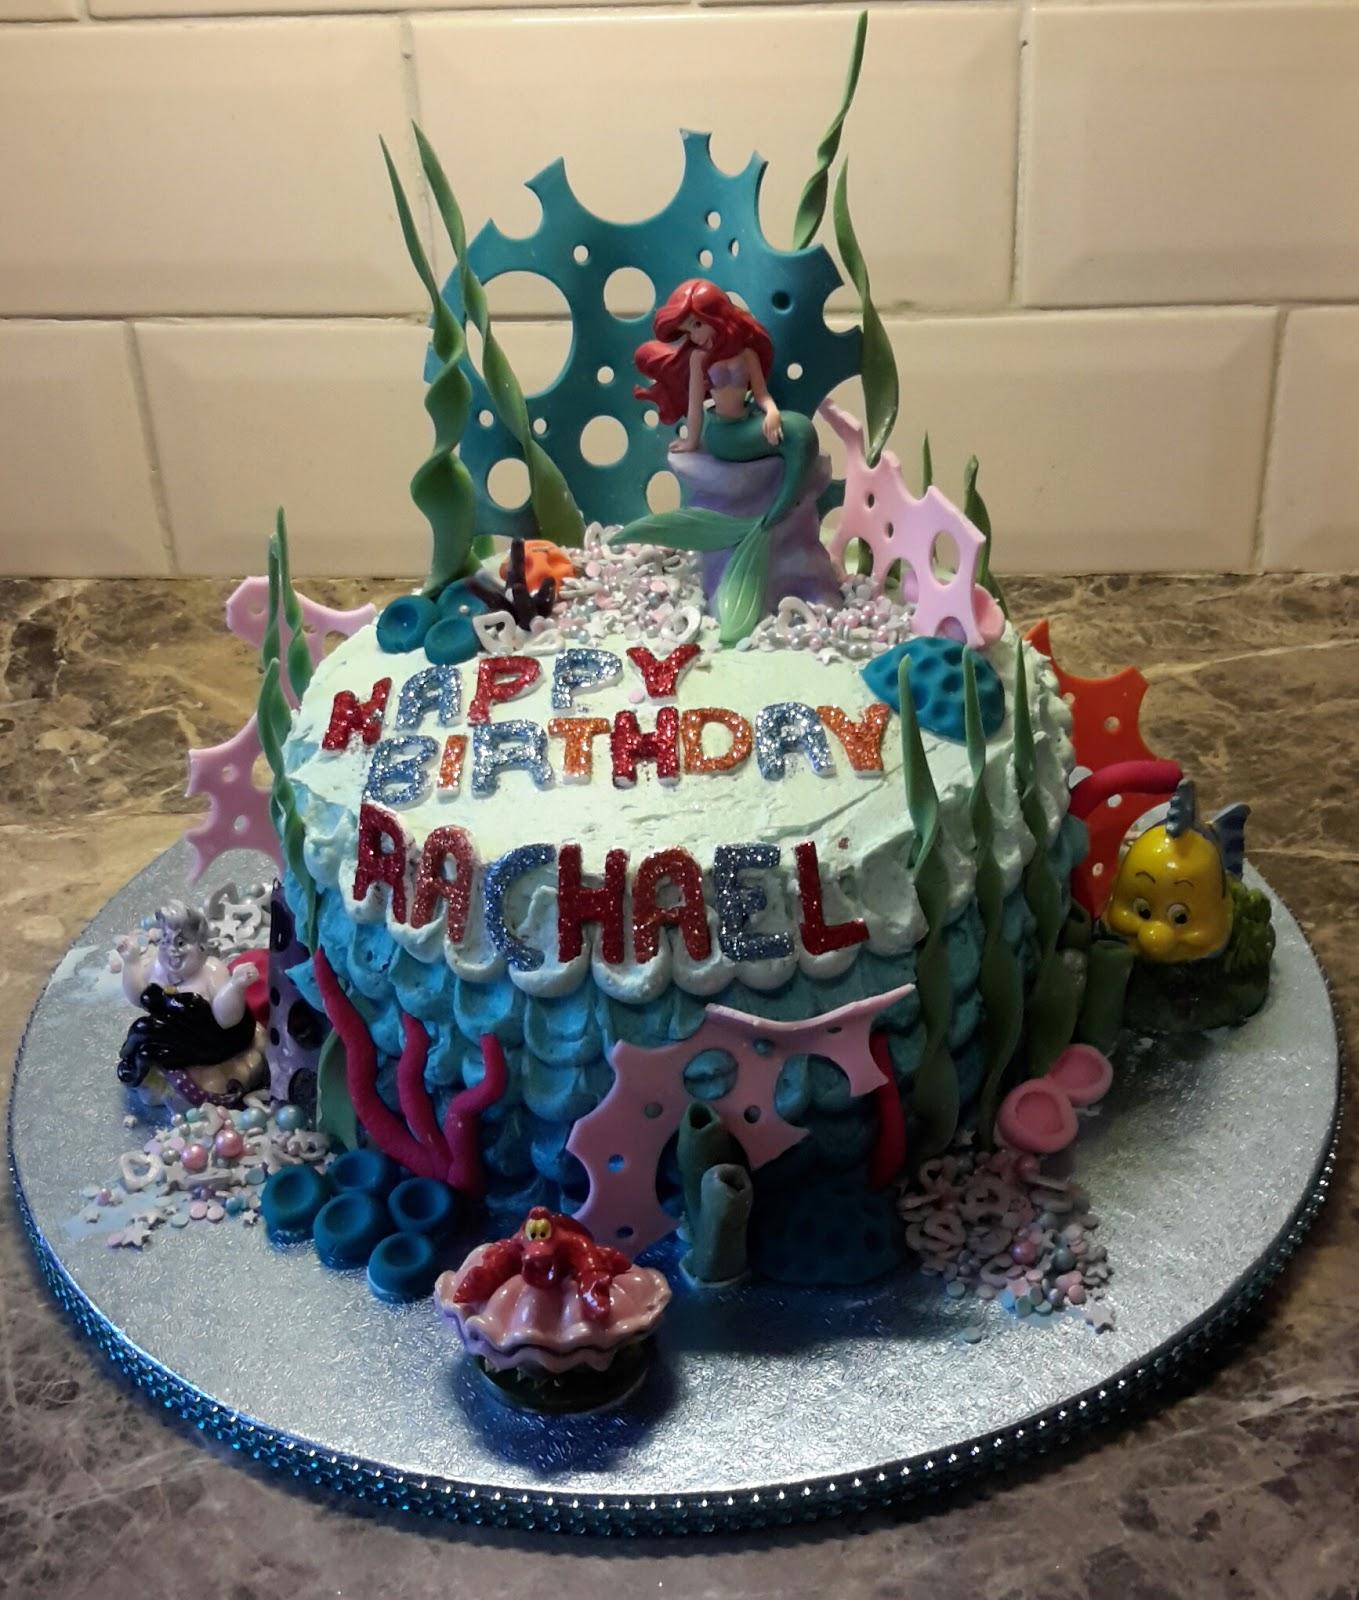 A Little Bit Of Heaven Disney The Little Mermaid Birthday Cake